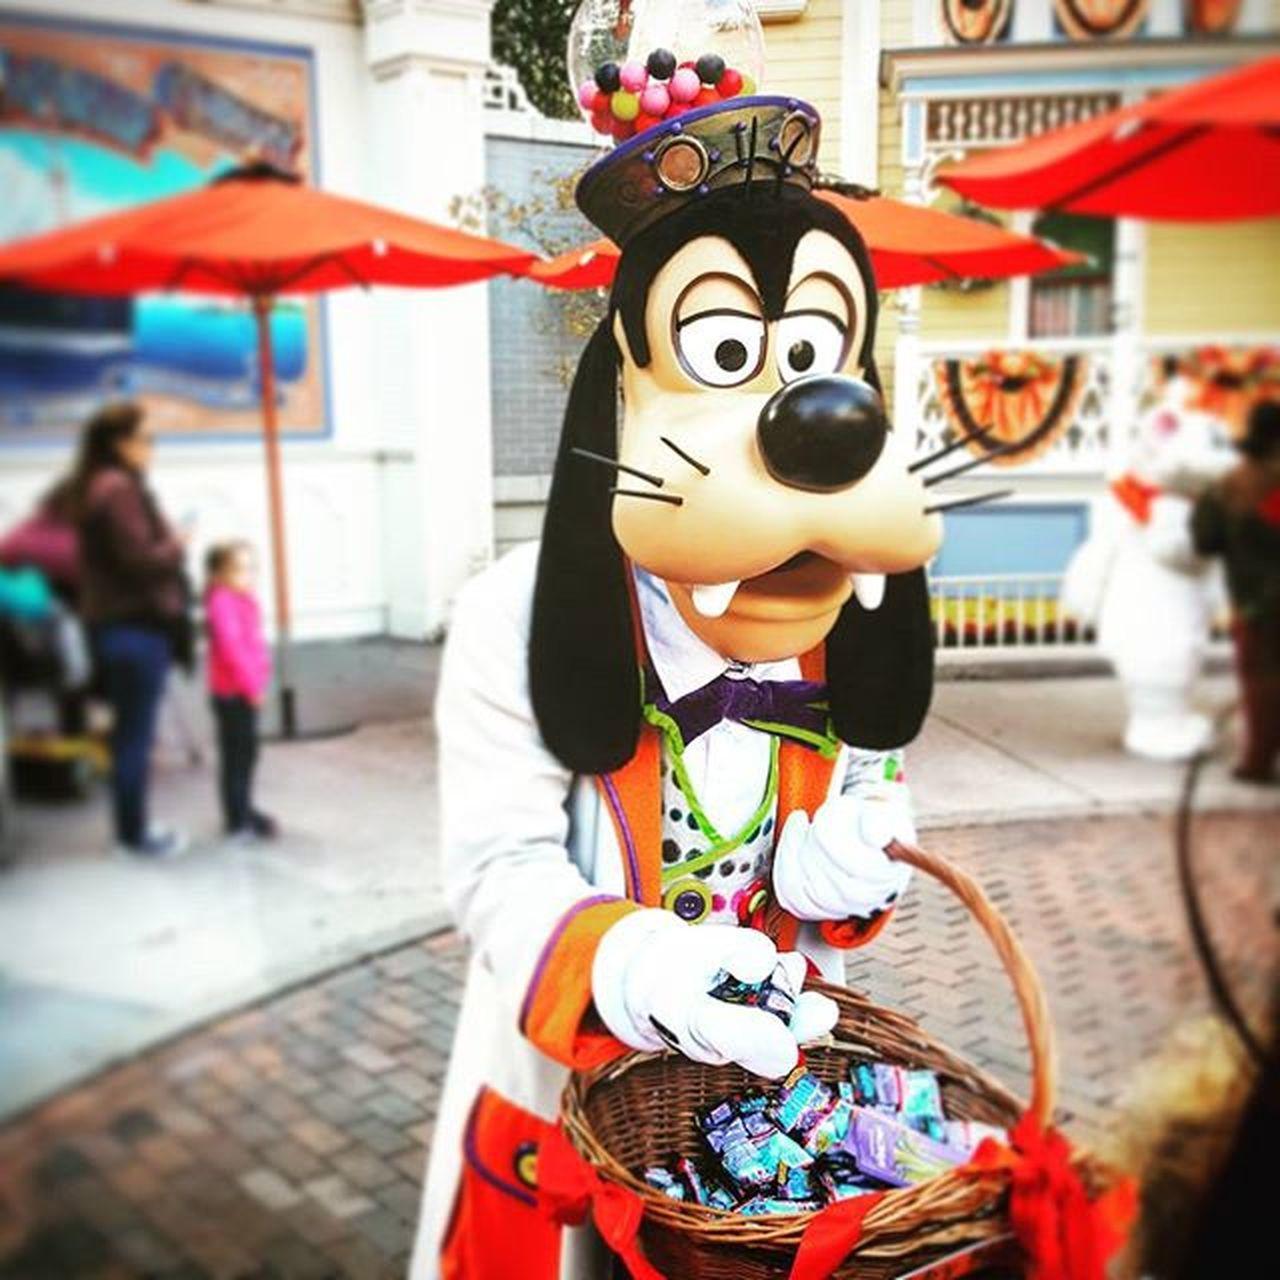 Disneylandparis Disneyland Disney Halloween goofy dingo